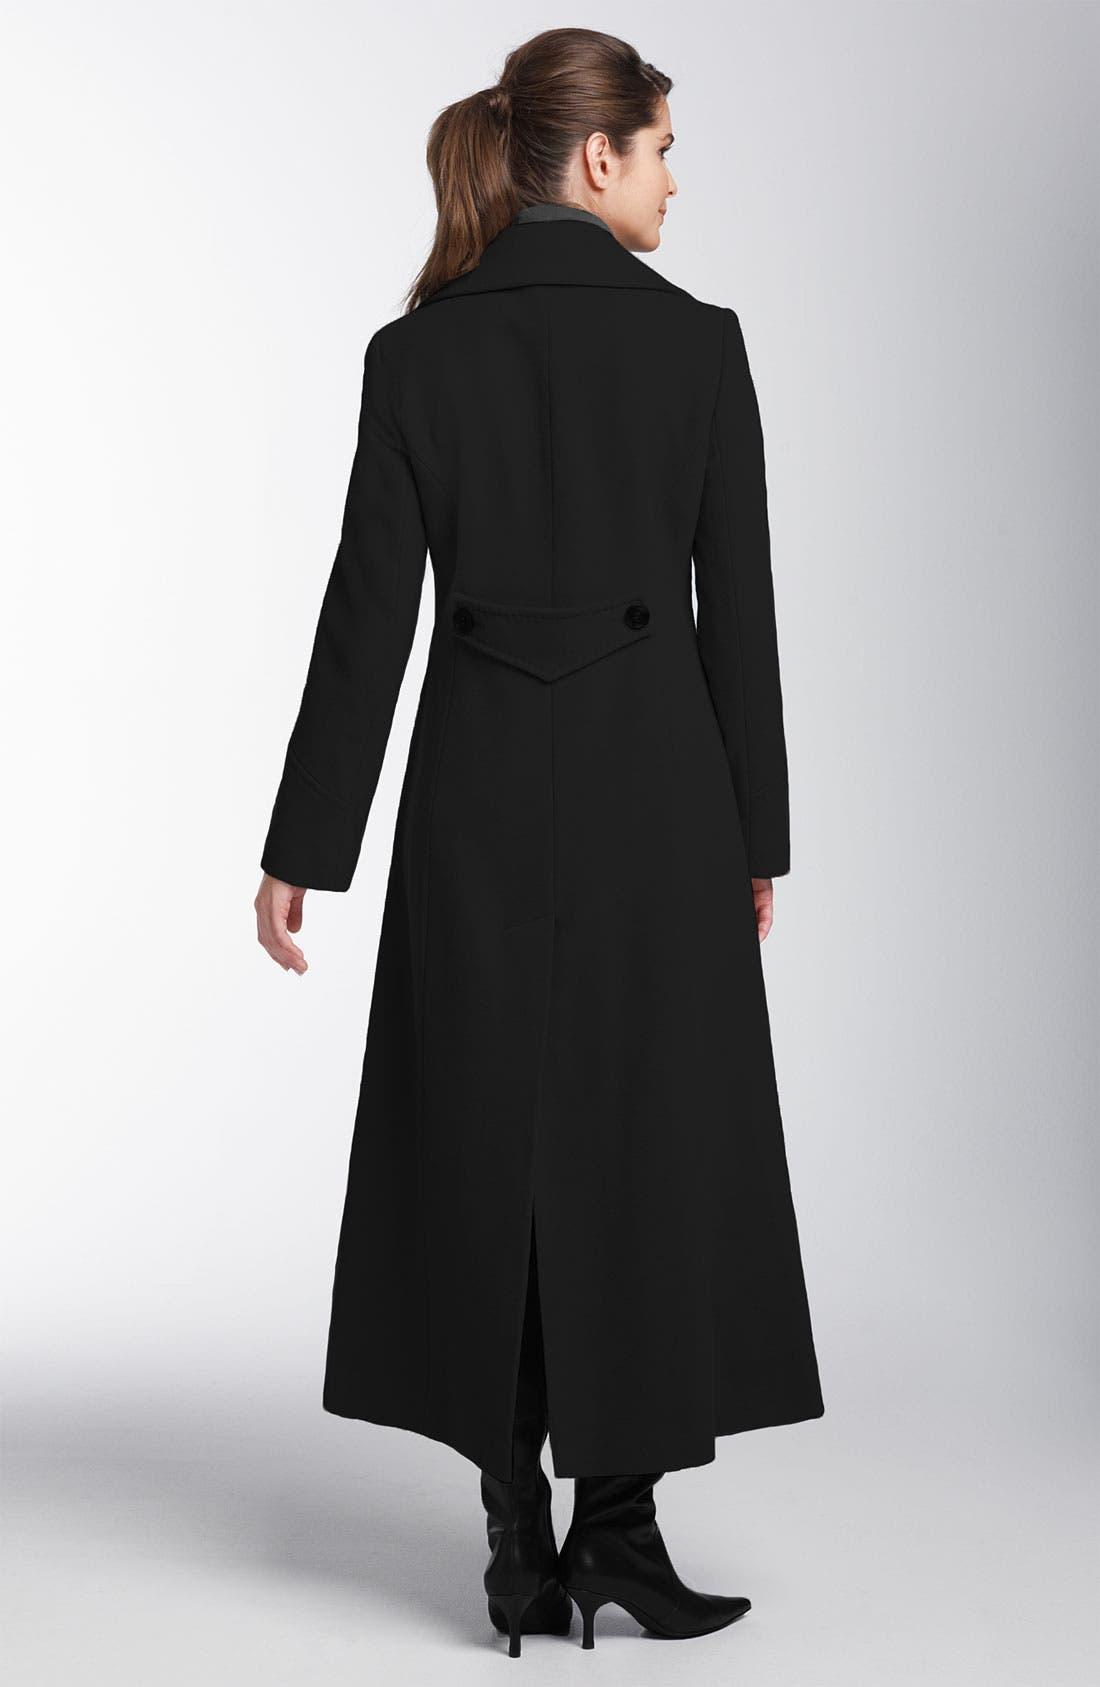 Wool & Cashmere Coat,                             Alternate thumbnail 2, color,                             001